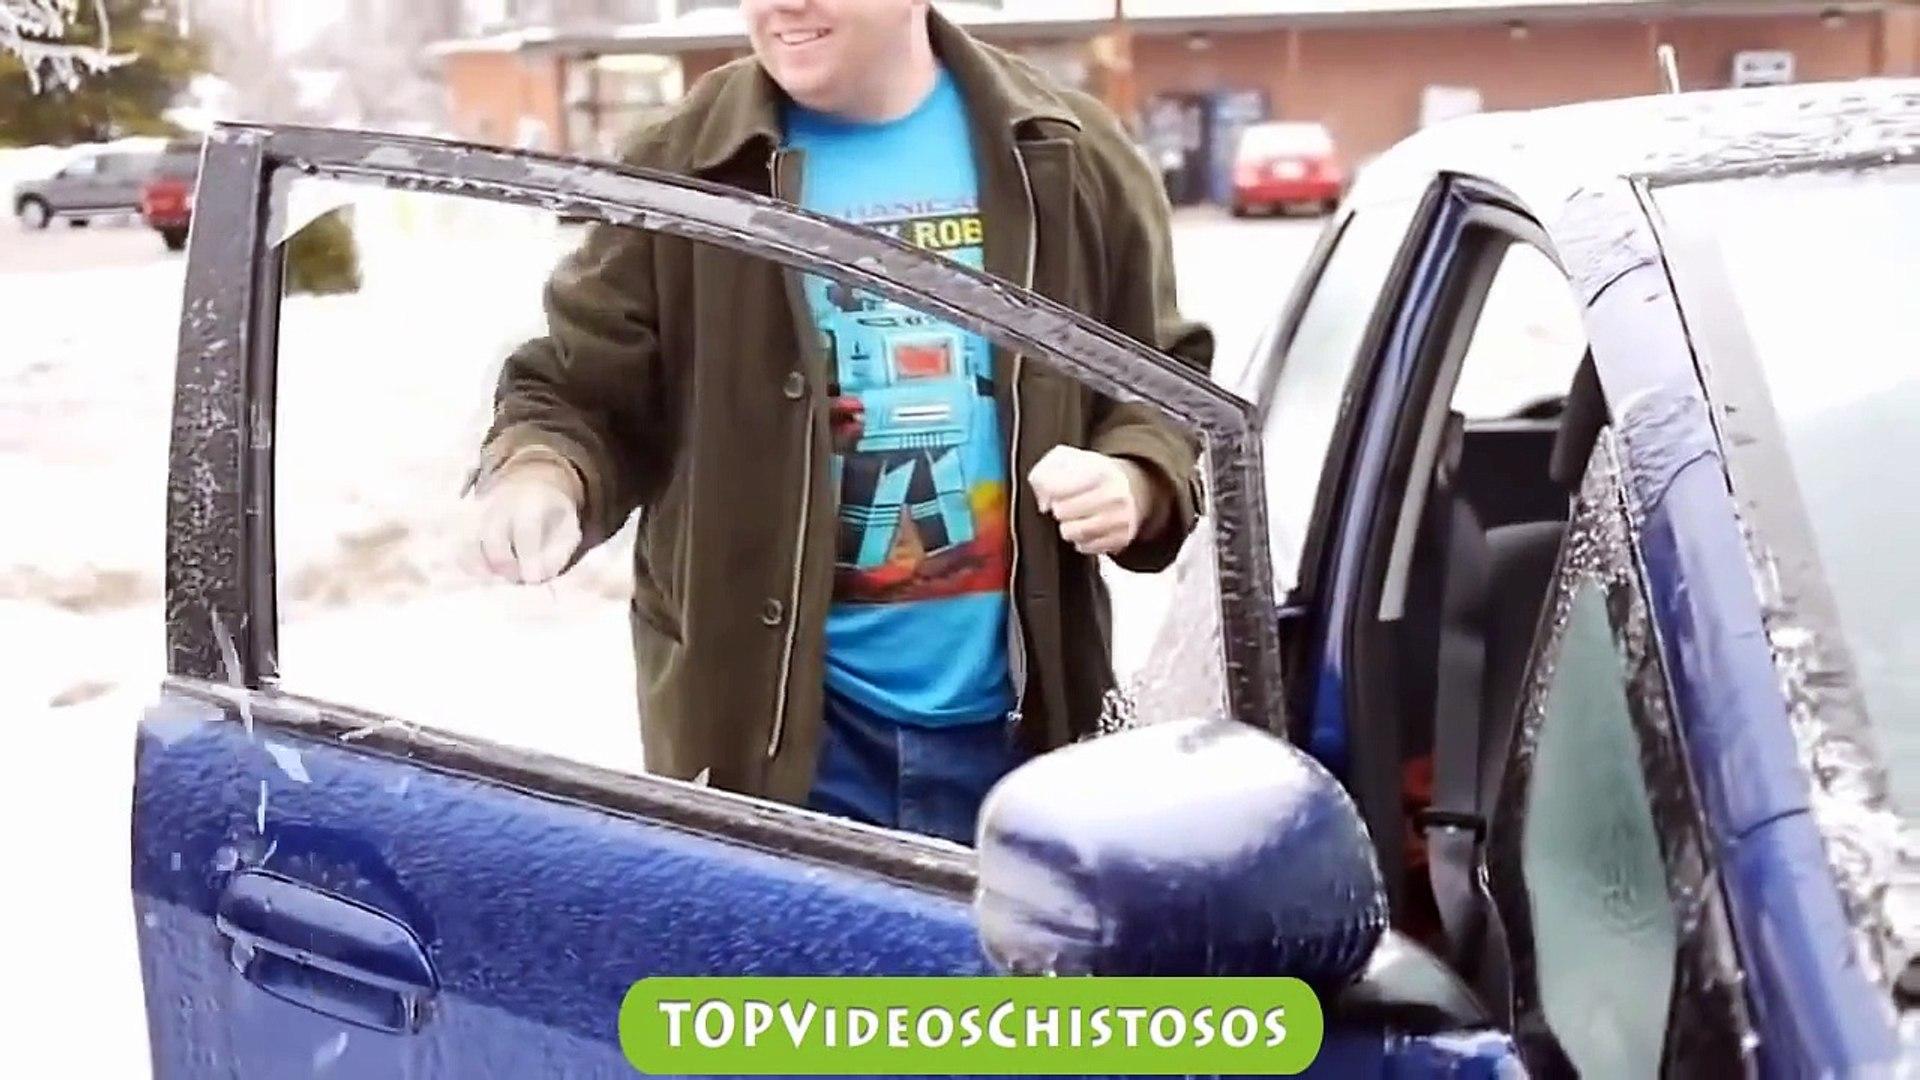 Videos Graciosos - Videos Chistosos - Mejores Videos de Risa 2014 - Videos de Caidas Graciosas 2